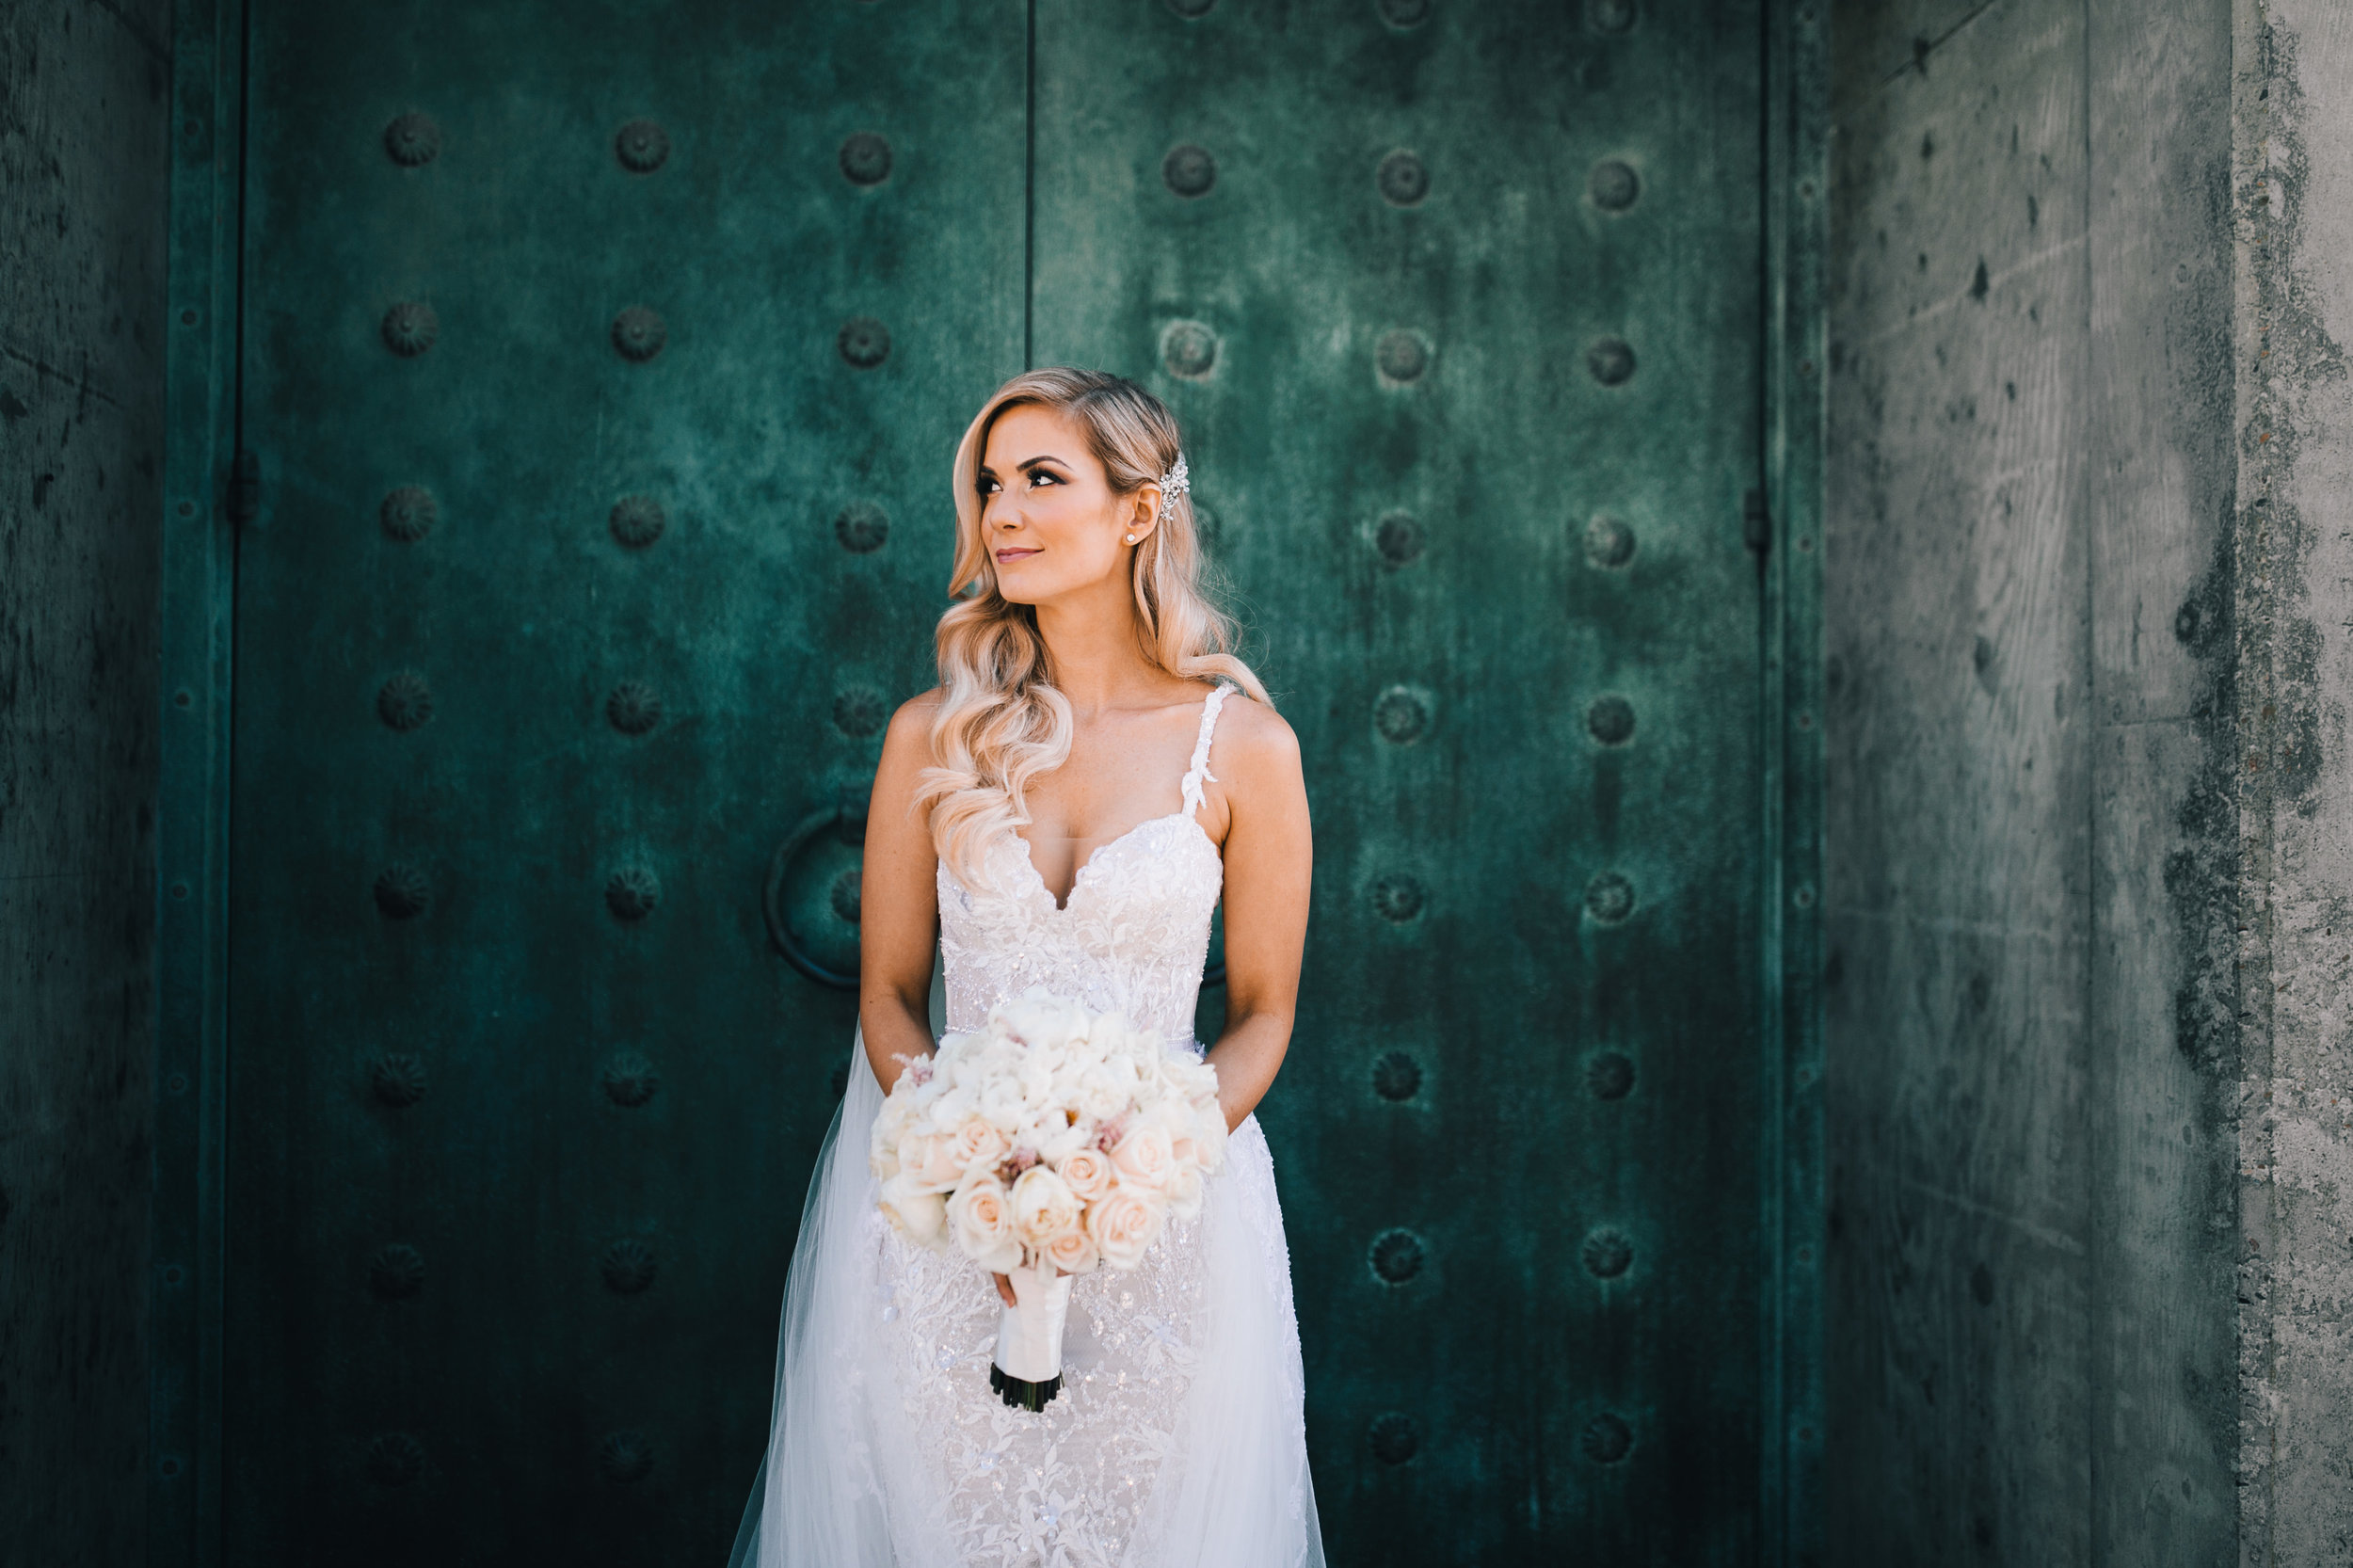 2018.09.08 Litsa and Sofo Greek Wedding Sneak Peak-2.jpg